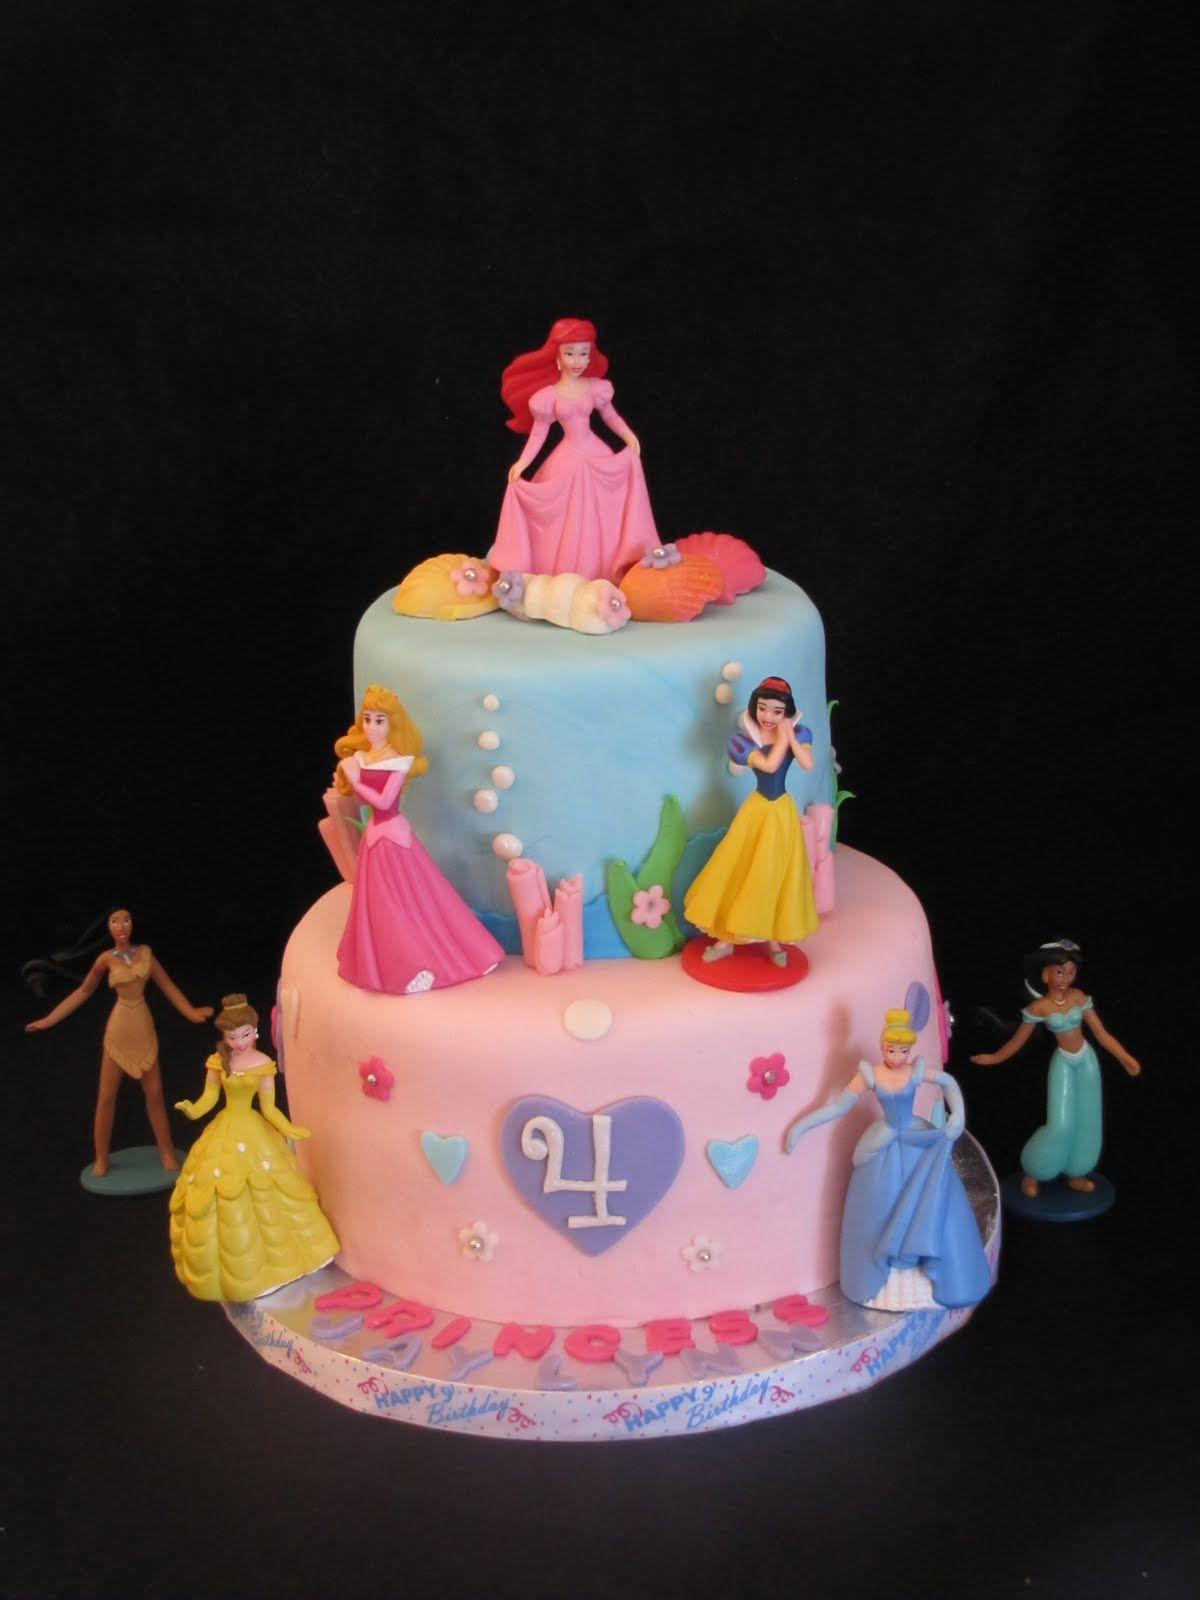 Disney Princess themed birthday cake. This four year old